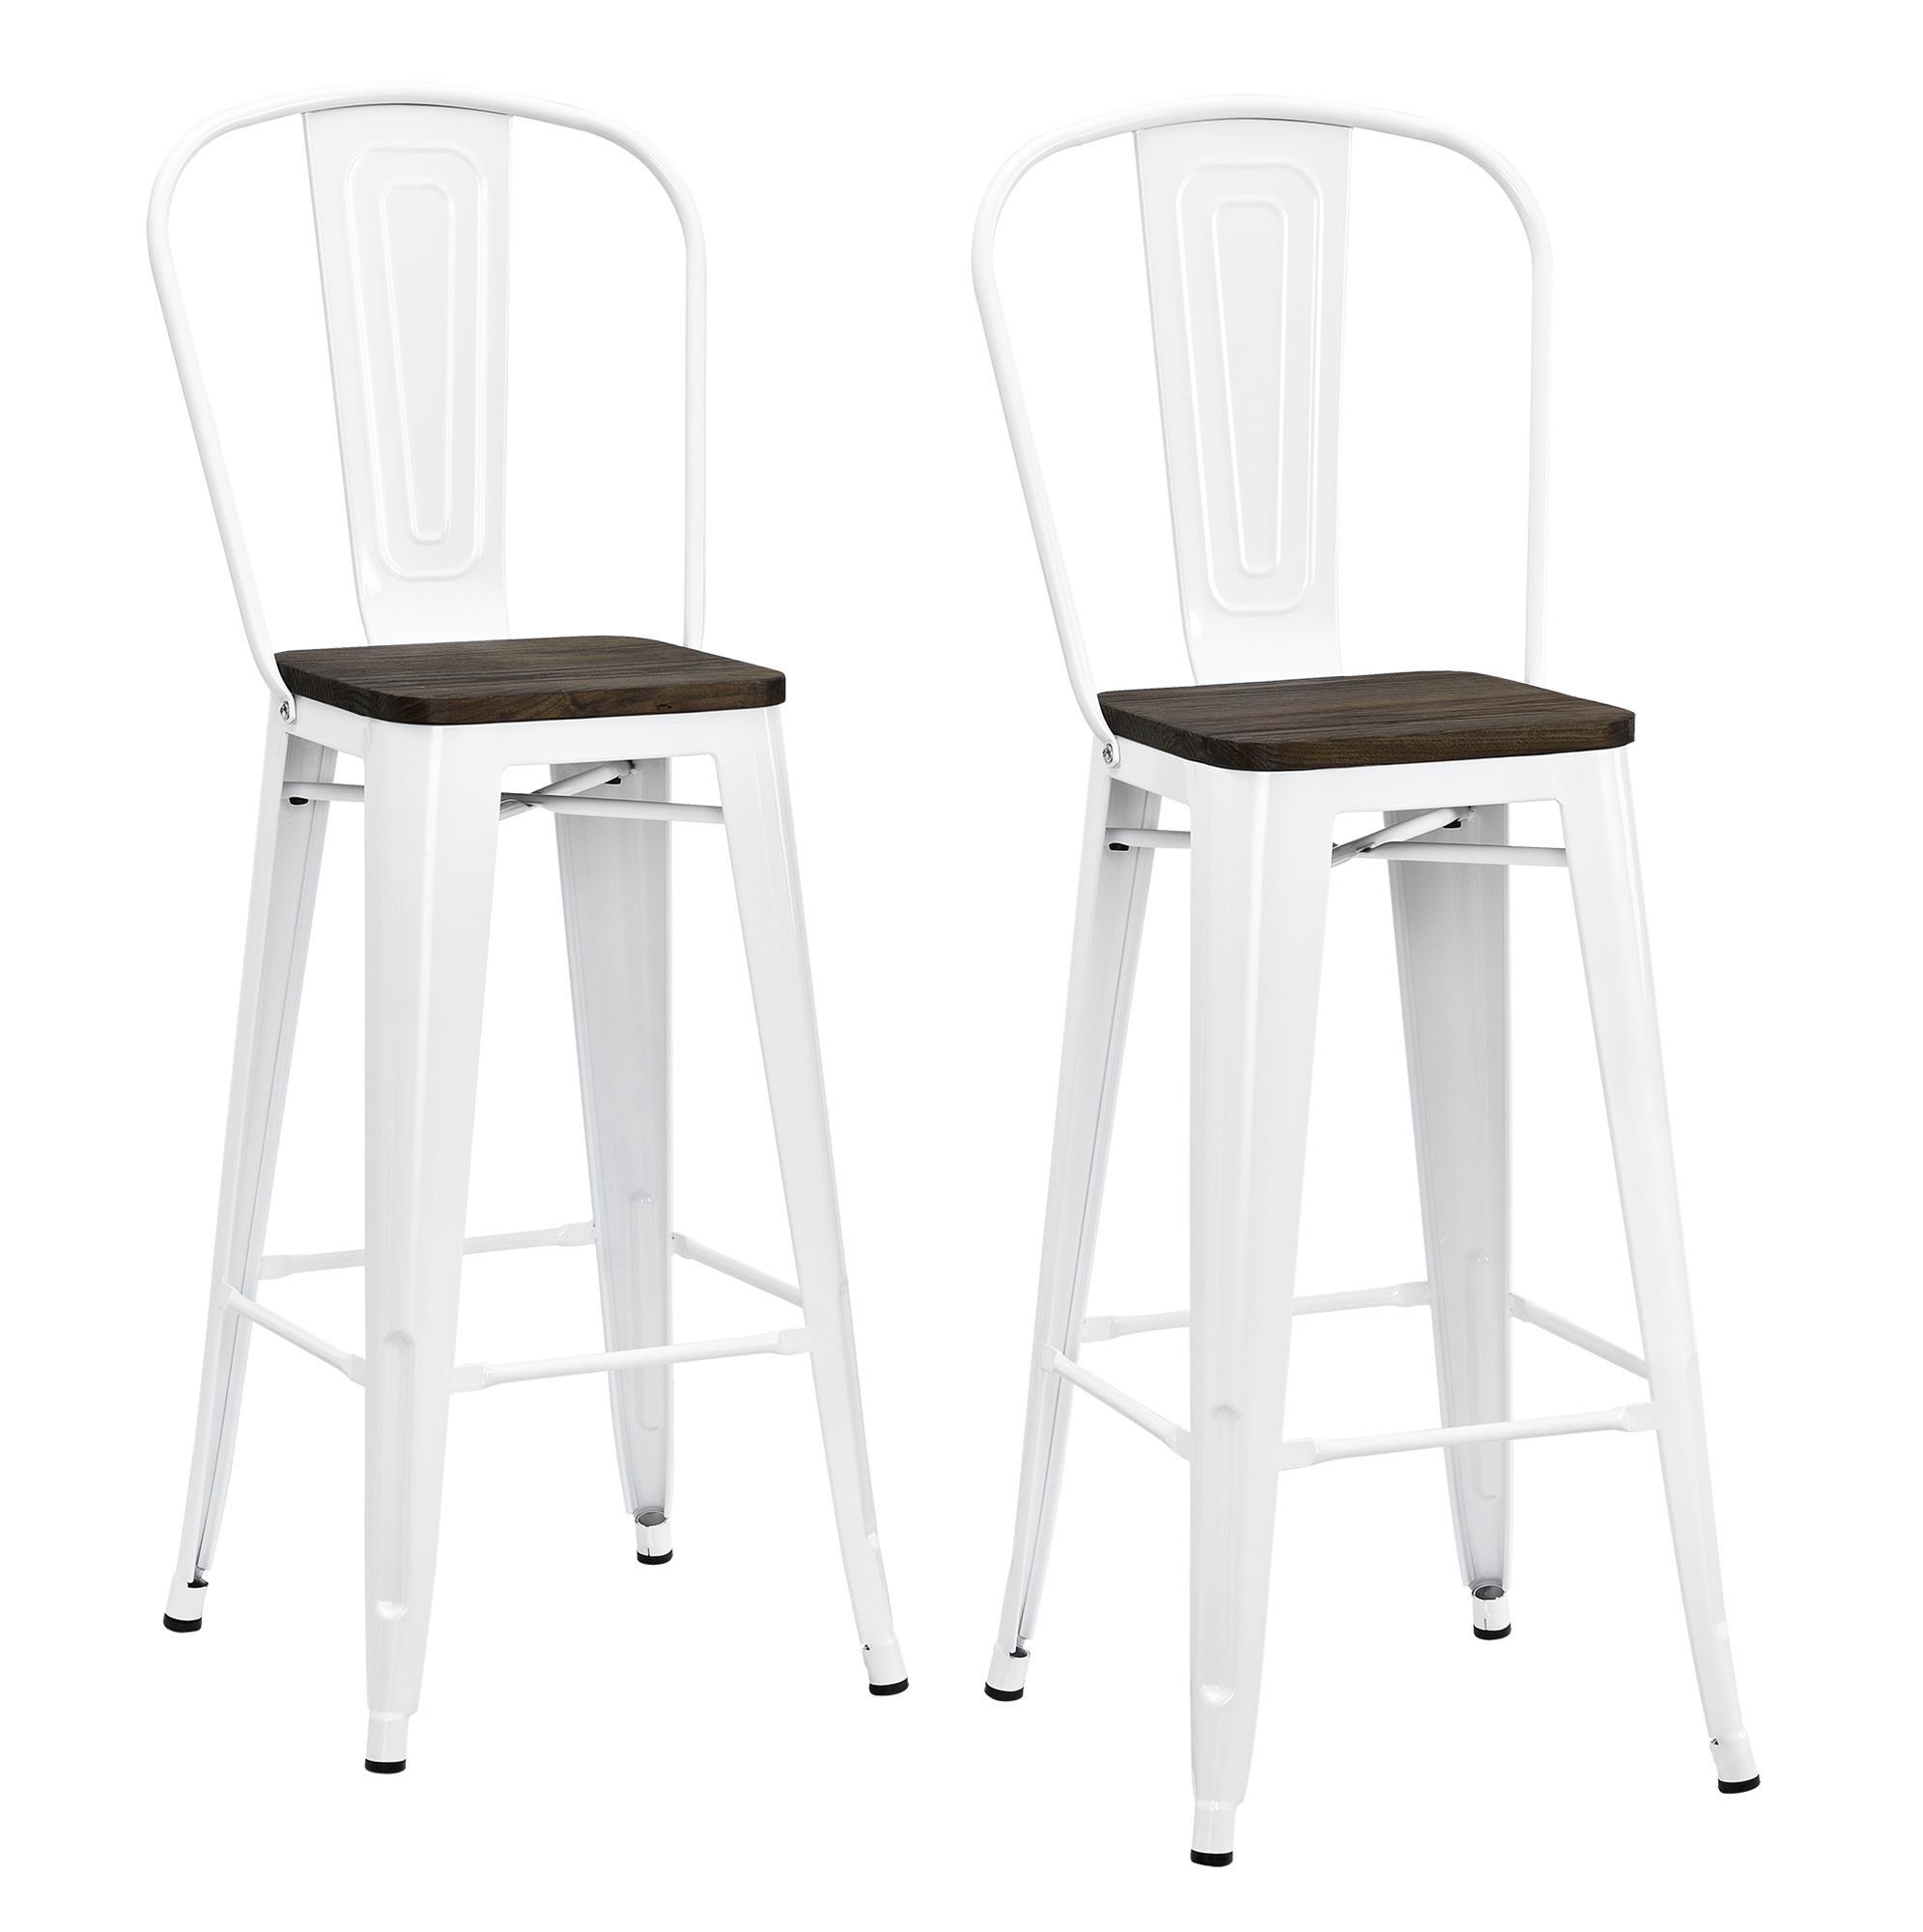 "Dorel Luxor White 30"" Metal Bar Stool with Wood Seat Set of 2"